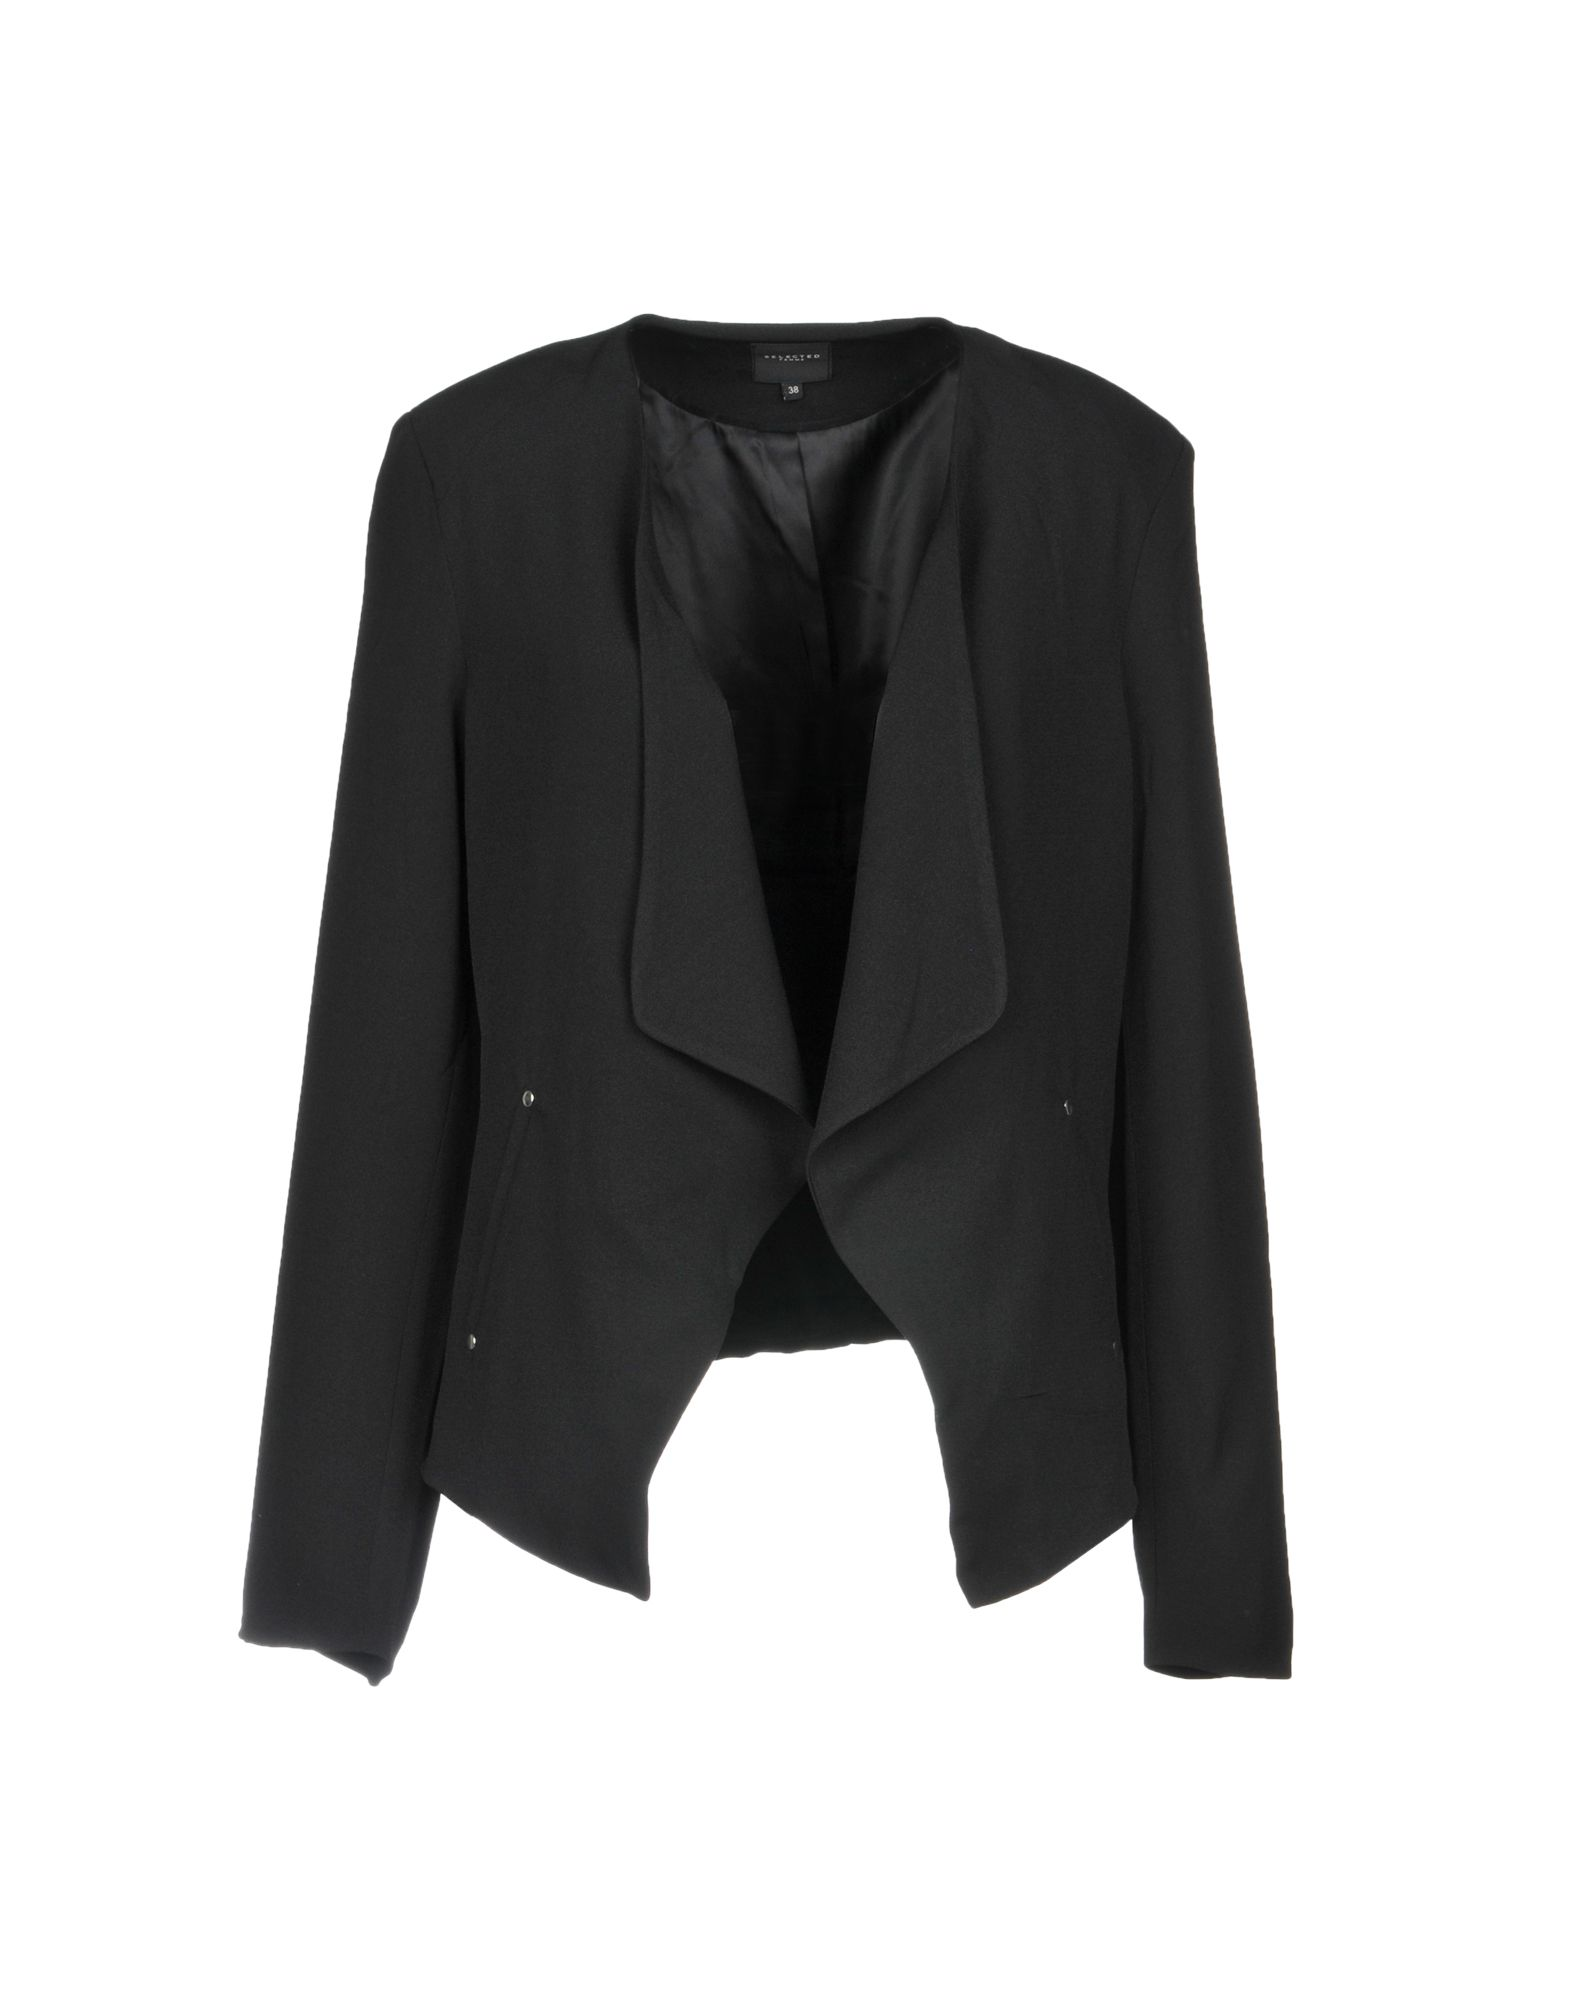 SELECTED FEMME Пиджак пиджак костюм selected 41515z001030 41515z001